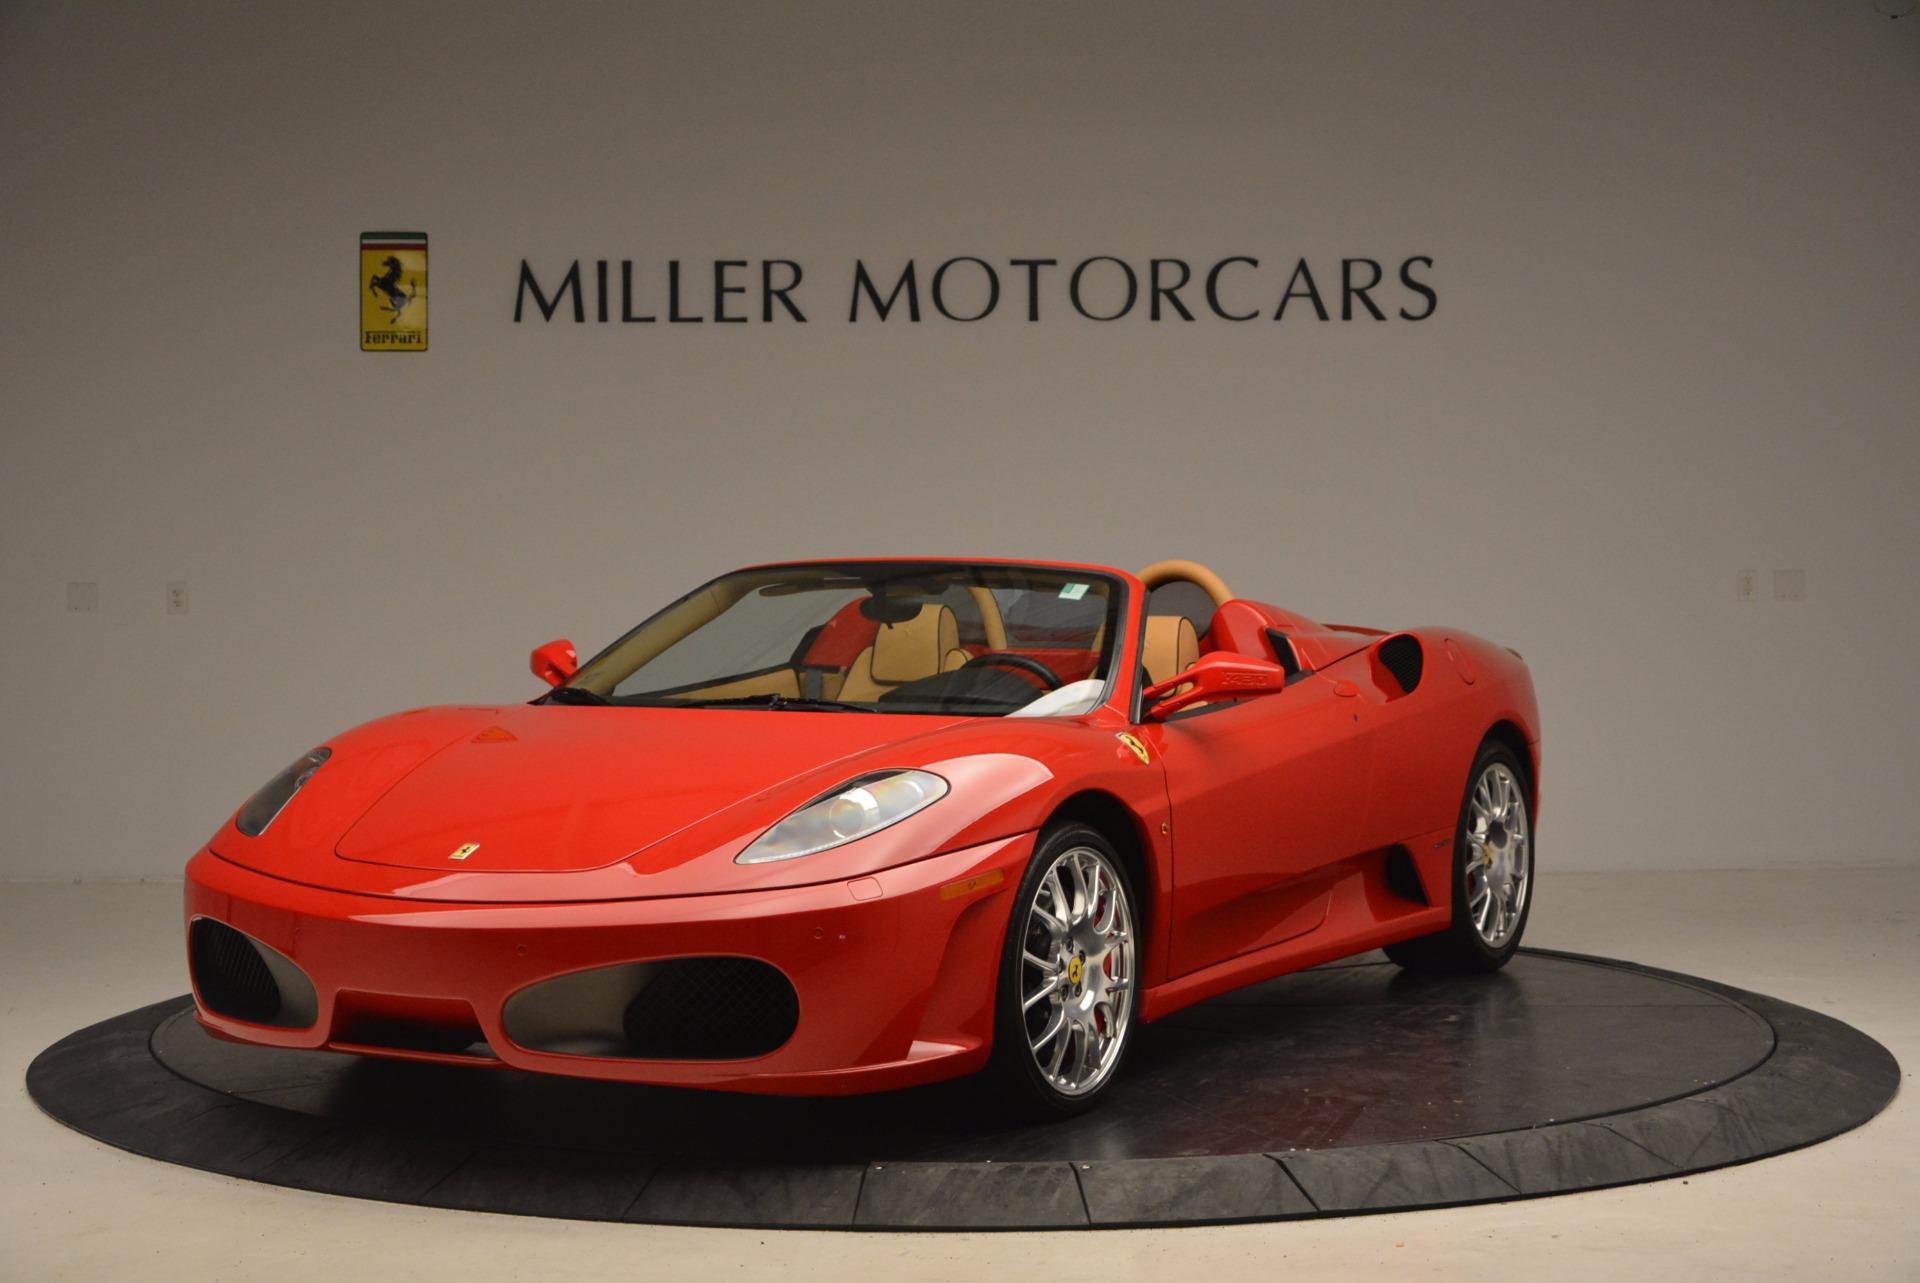 Used 2008 Ferrari F430 Spider for sale Sold at Maserati of Westport in Westport CT 06880 1